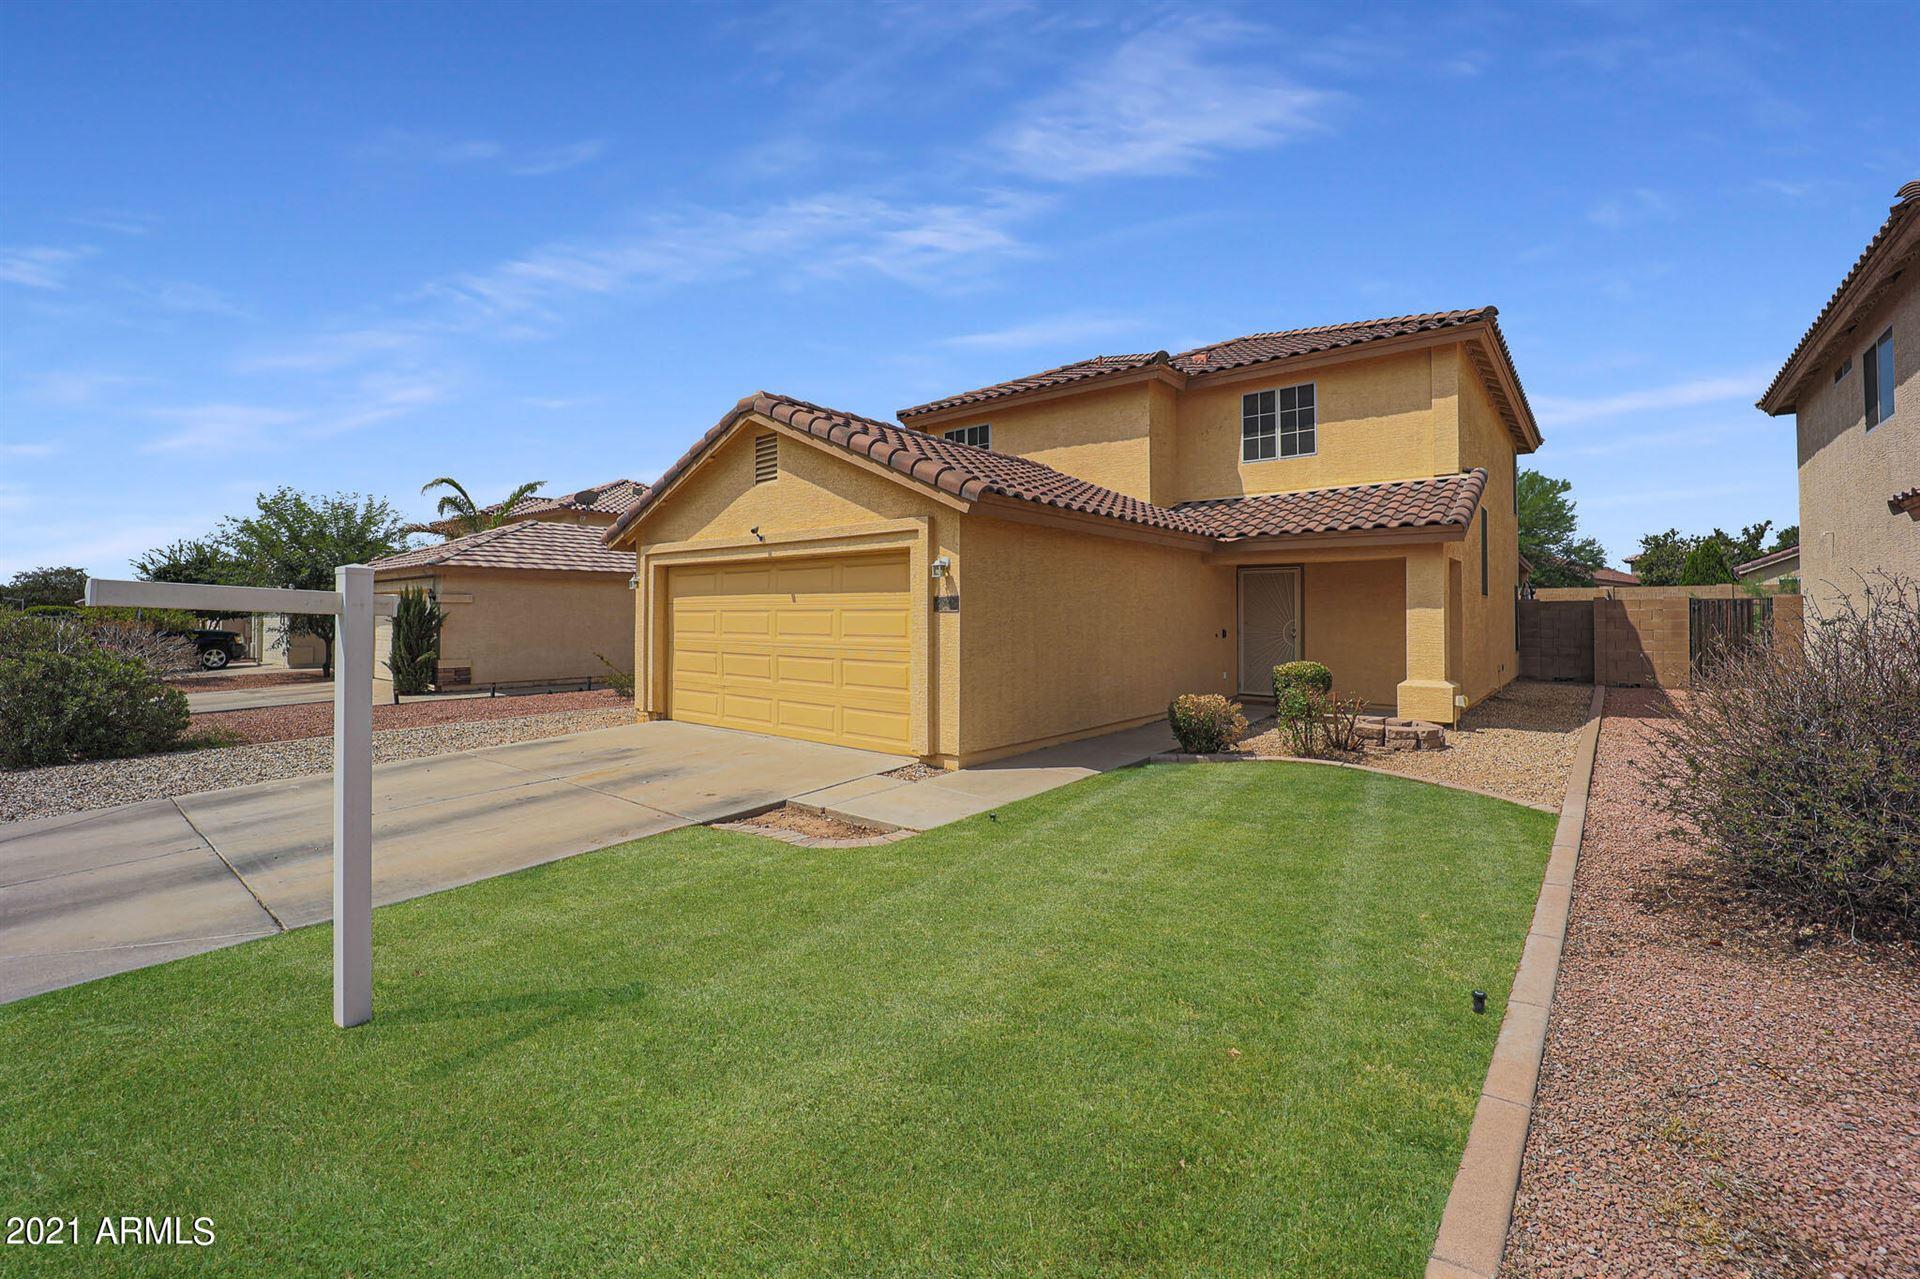 Photo of 12922 N PALM Street, El Mirage, AZ 85335 (MLS # 6266147)